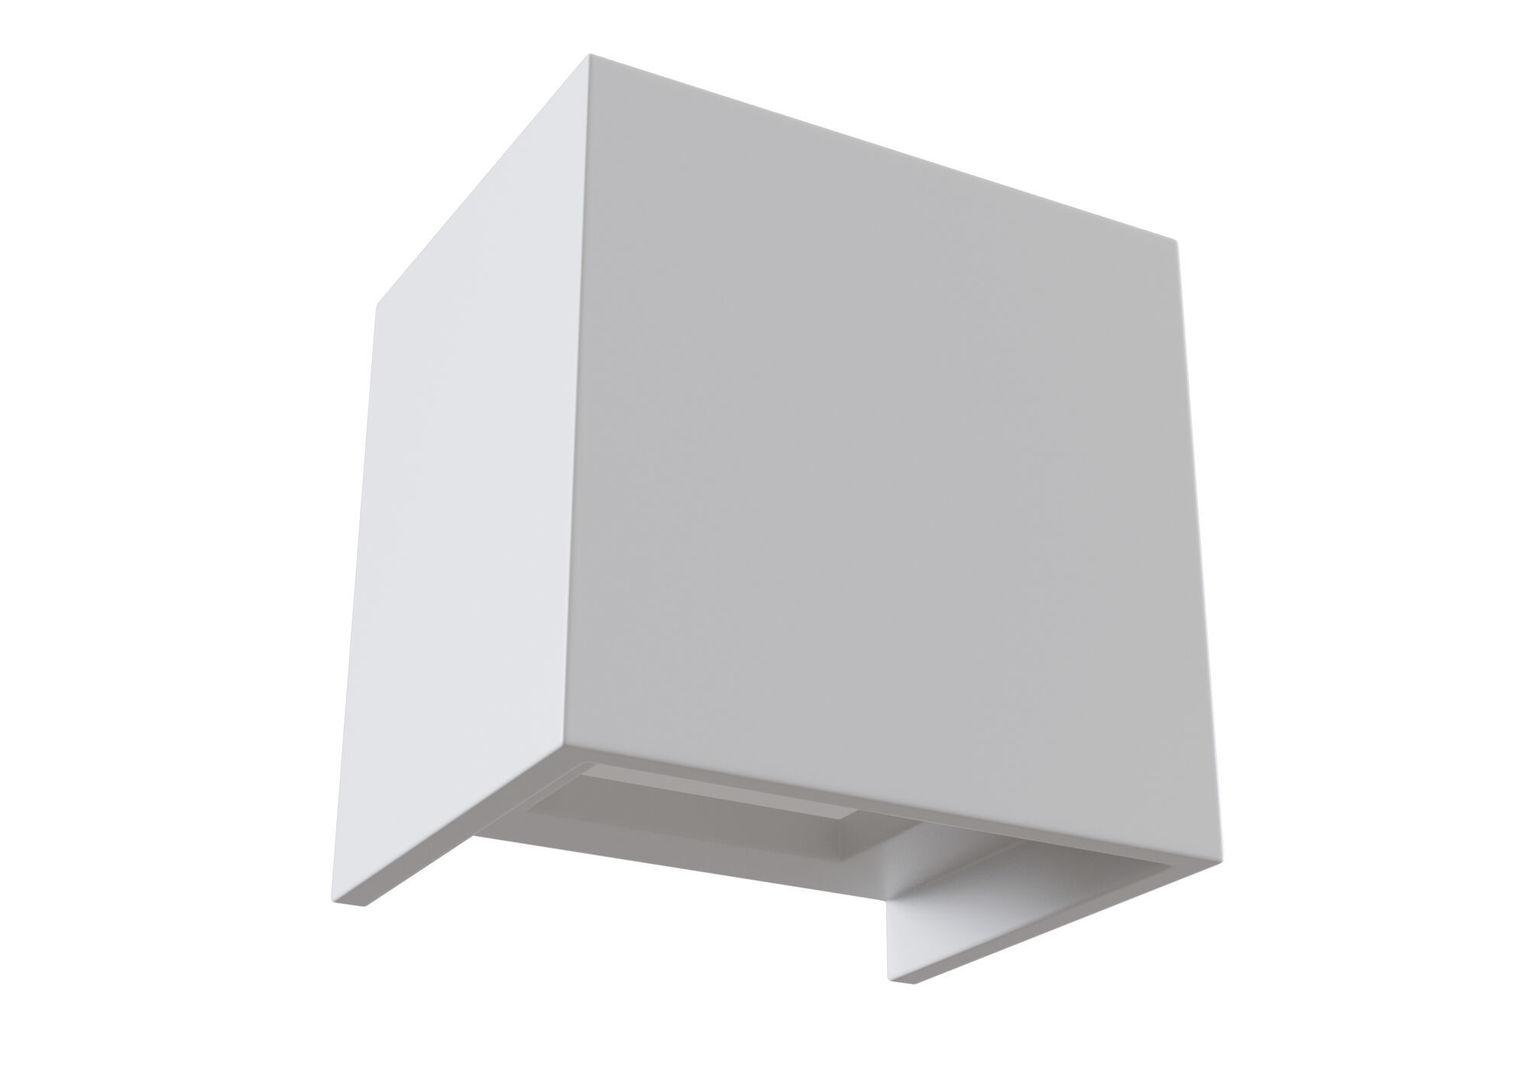 Wall light Maytoni Parma C155-WL-02-3W-W